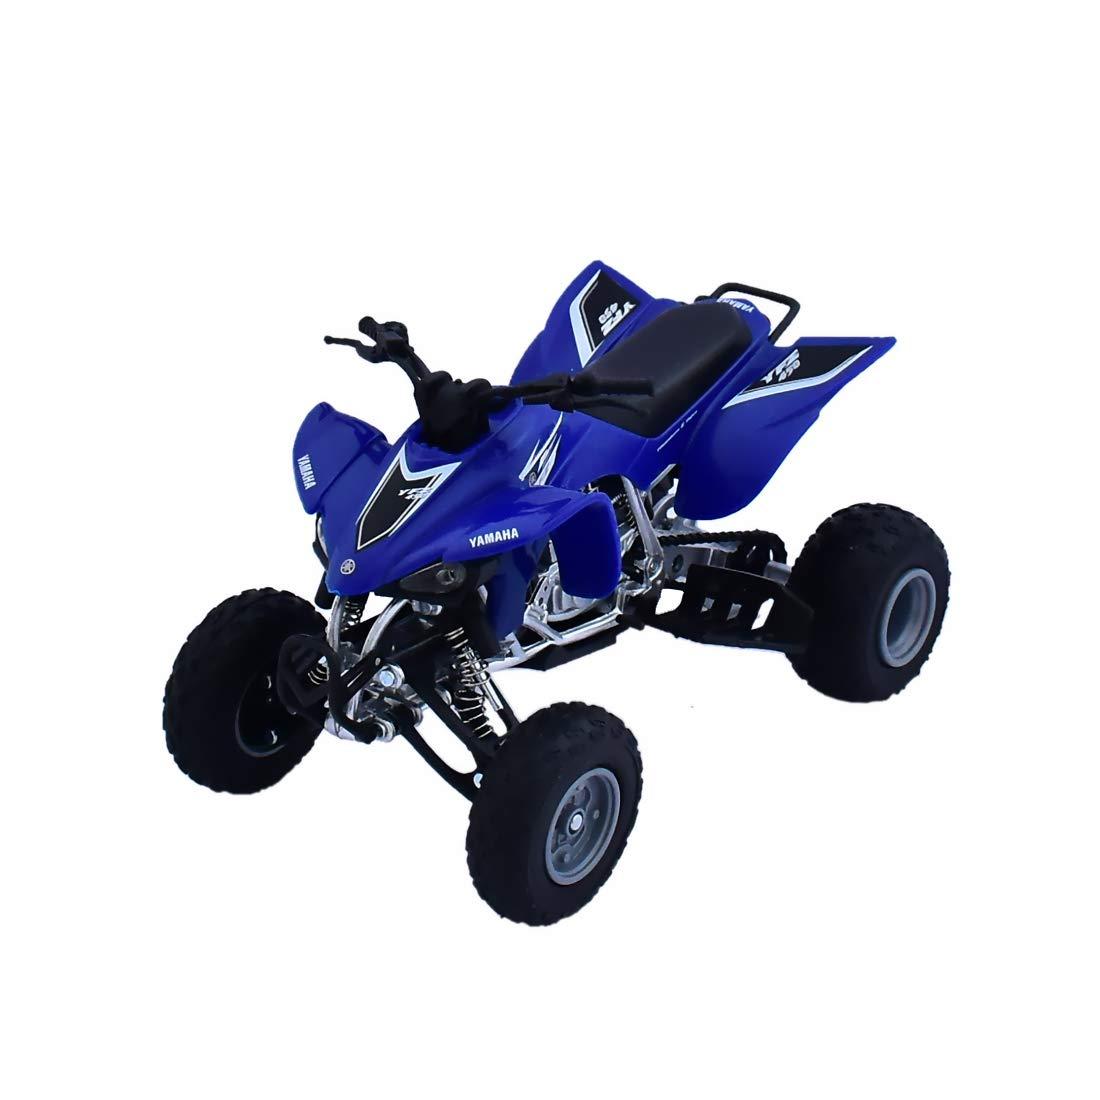 Yamaha 450 Atv >> New Ray Die Cast Yamaha Yzf 450 Atv Blue